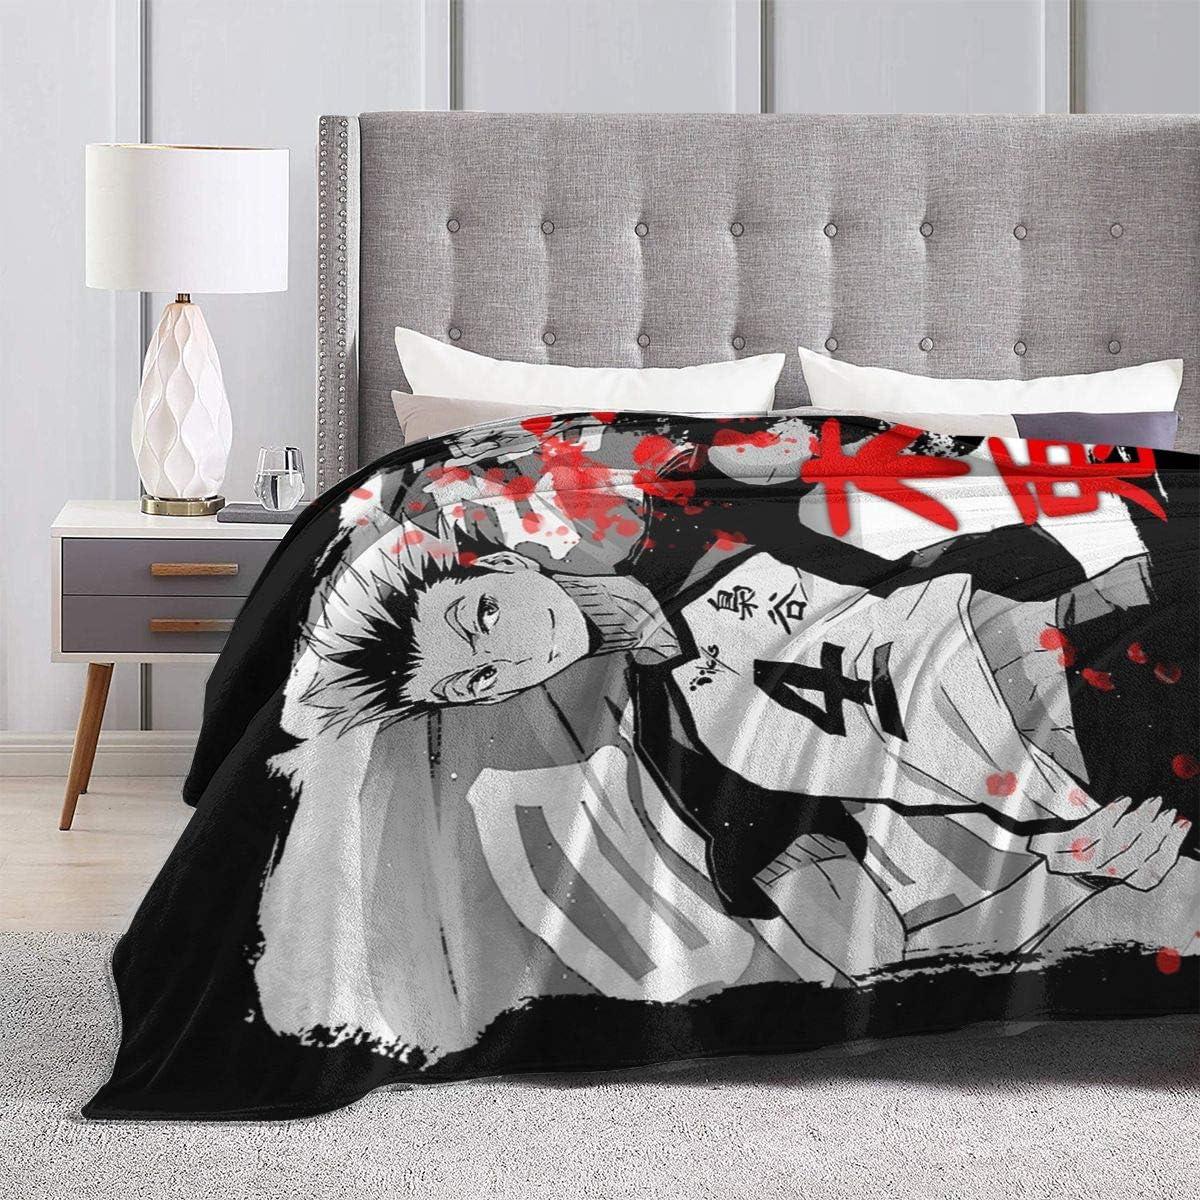 Fleece Blanket Throw Multi-Size Multicolor Haikyuu Tobio Kageyama Poster Lightweight Super Soft Cozy Luxury Bed Quilt Microfiber Gift For Living Room Bedroom Nursery 50X40Blanket For Kids